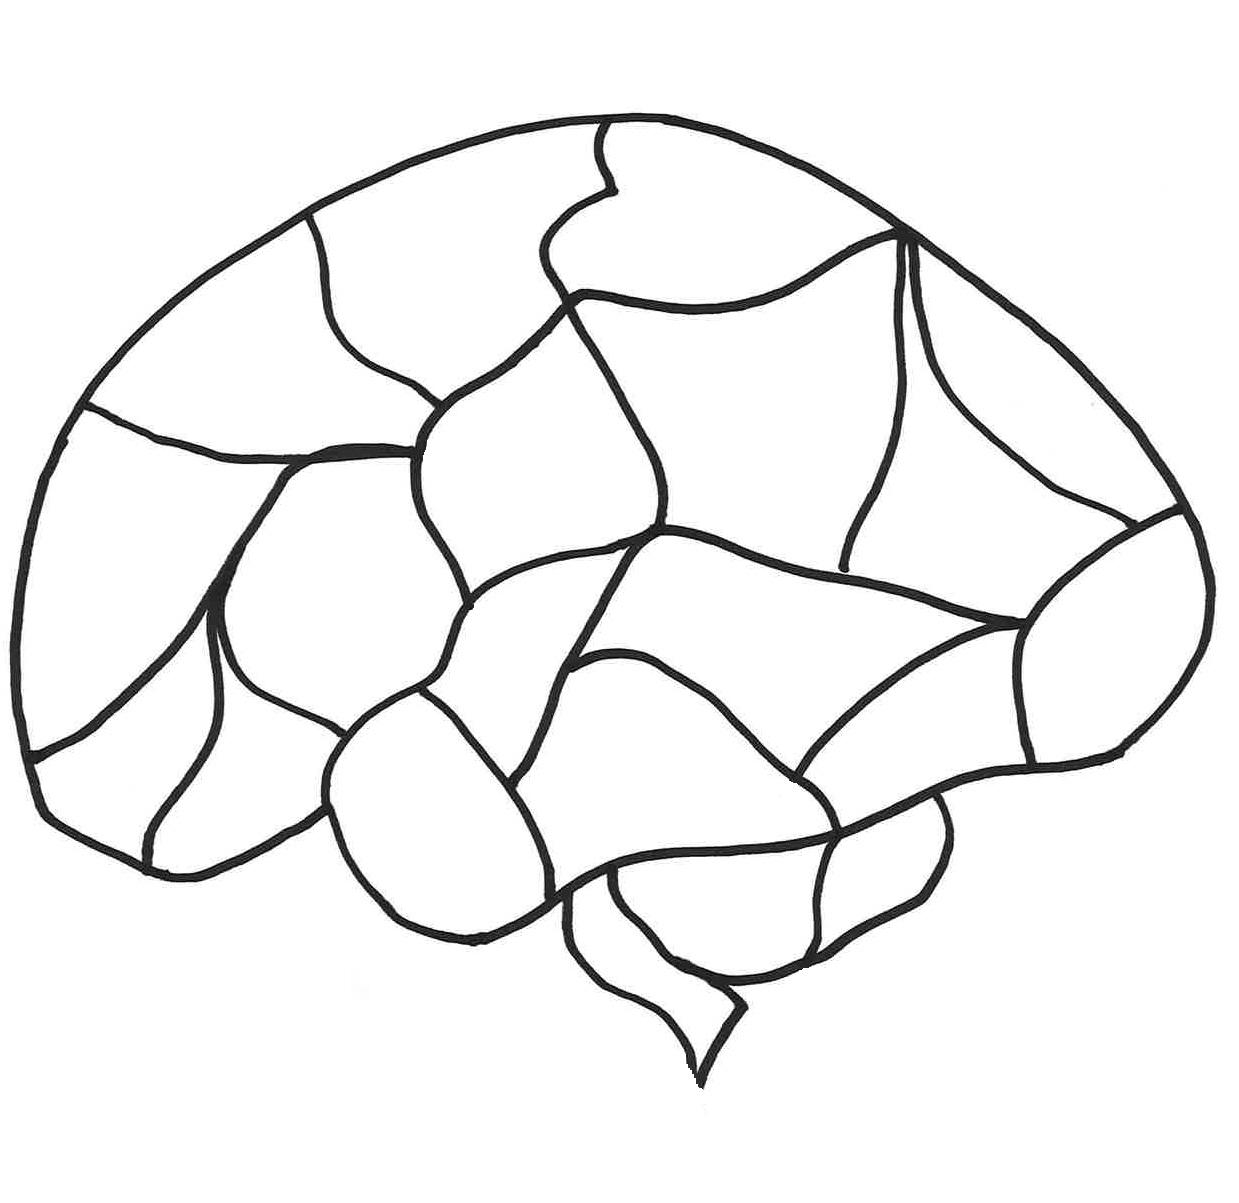 Free Unlabeled Brain Diagram Download Free Clip Art Free